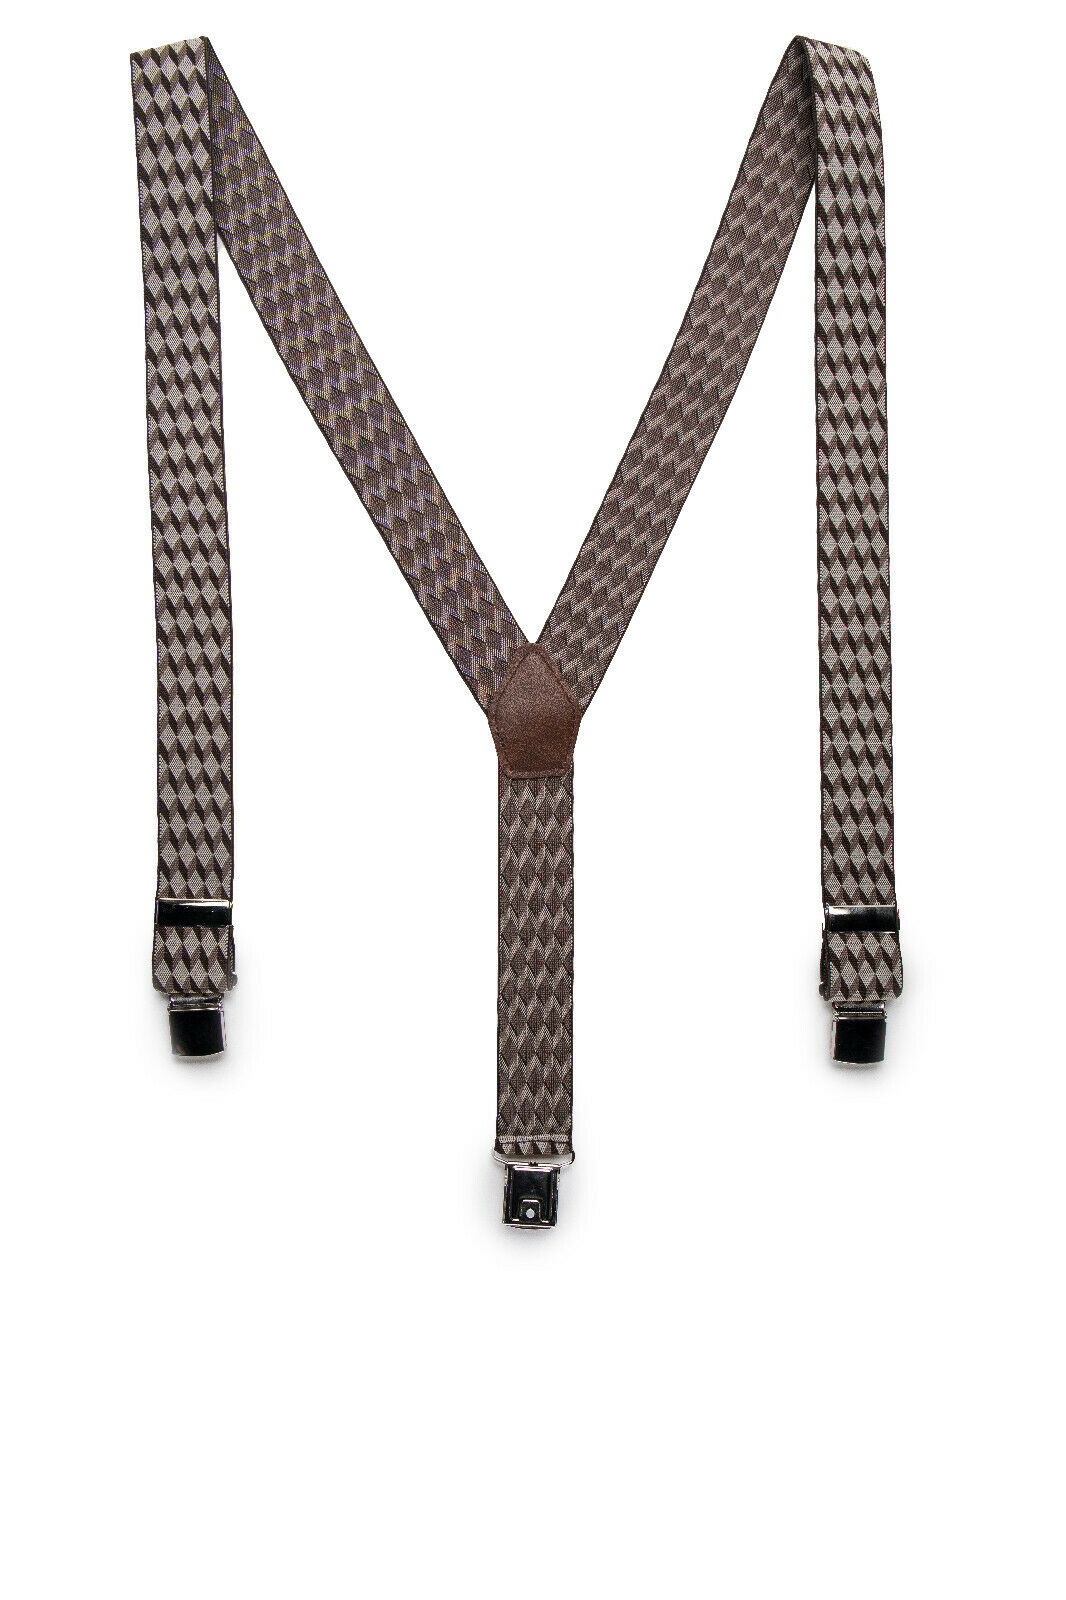 Clip Fashion Dress Vegan Suspender on Chechered Geometric Elastic & Adjustable